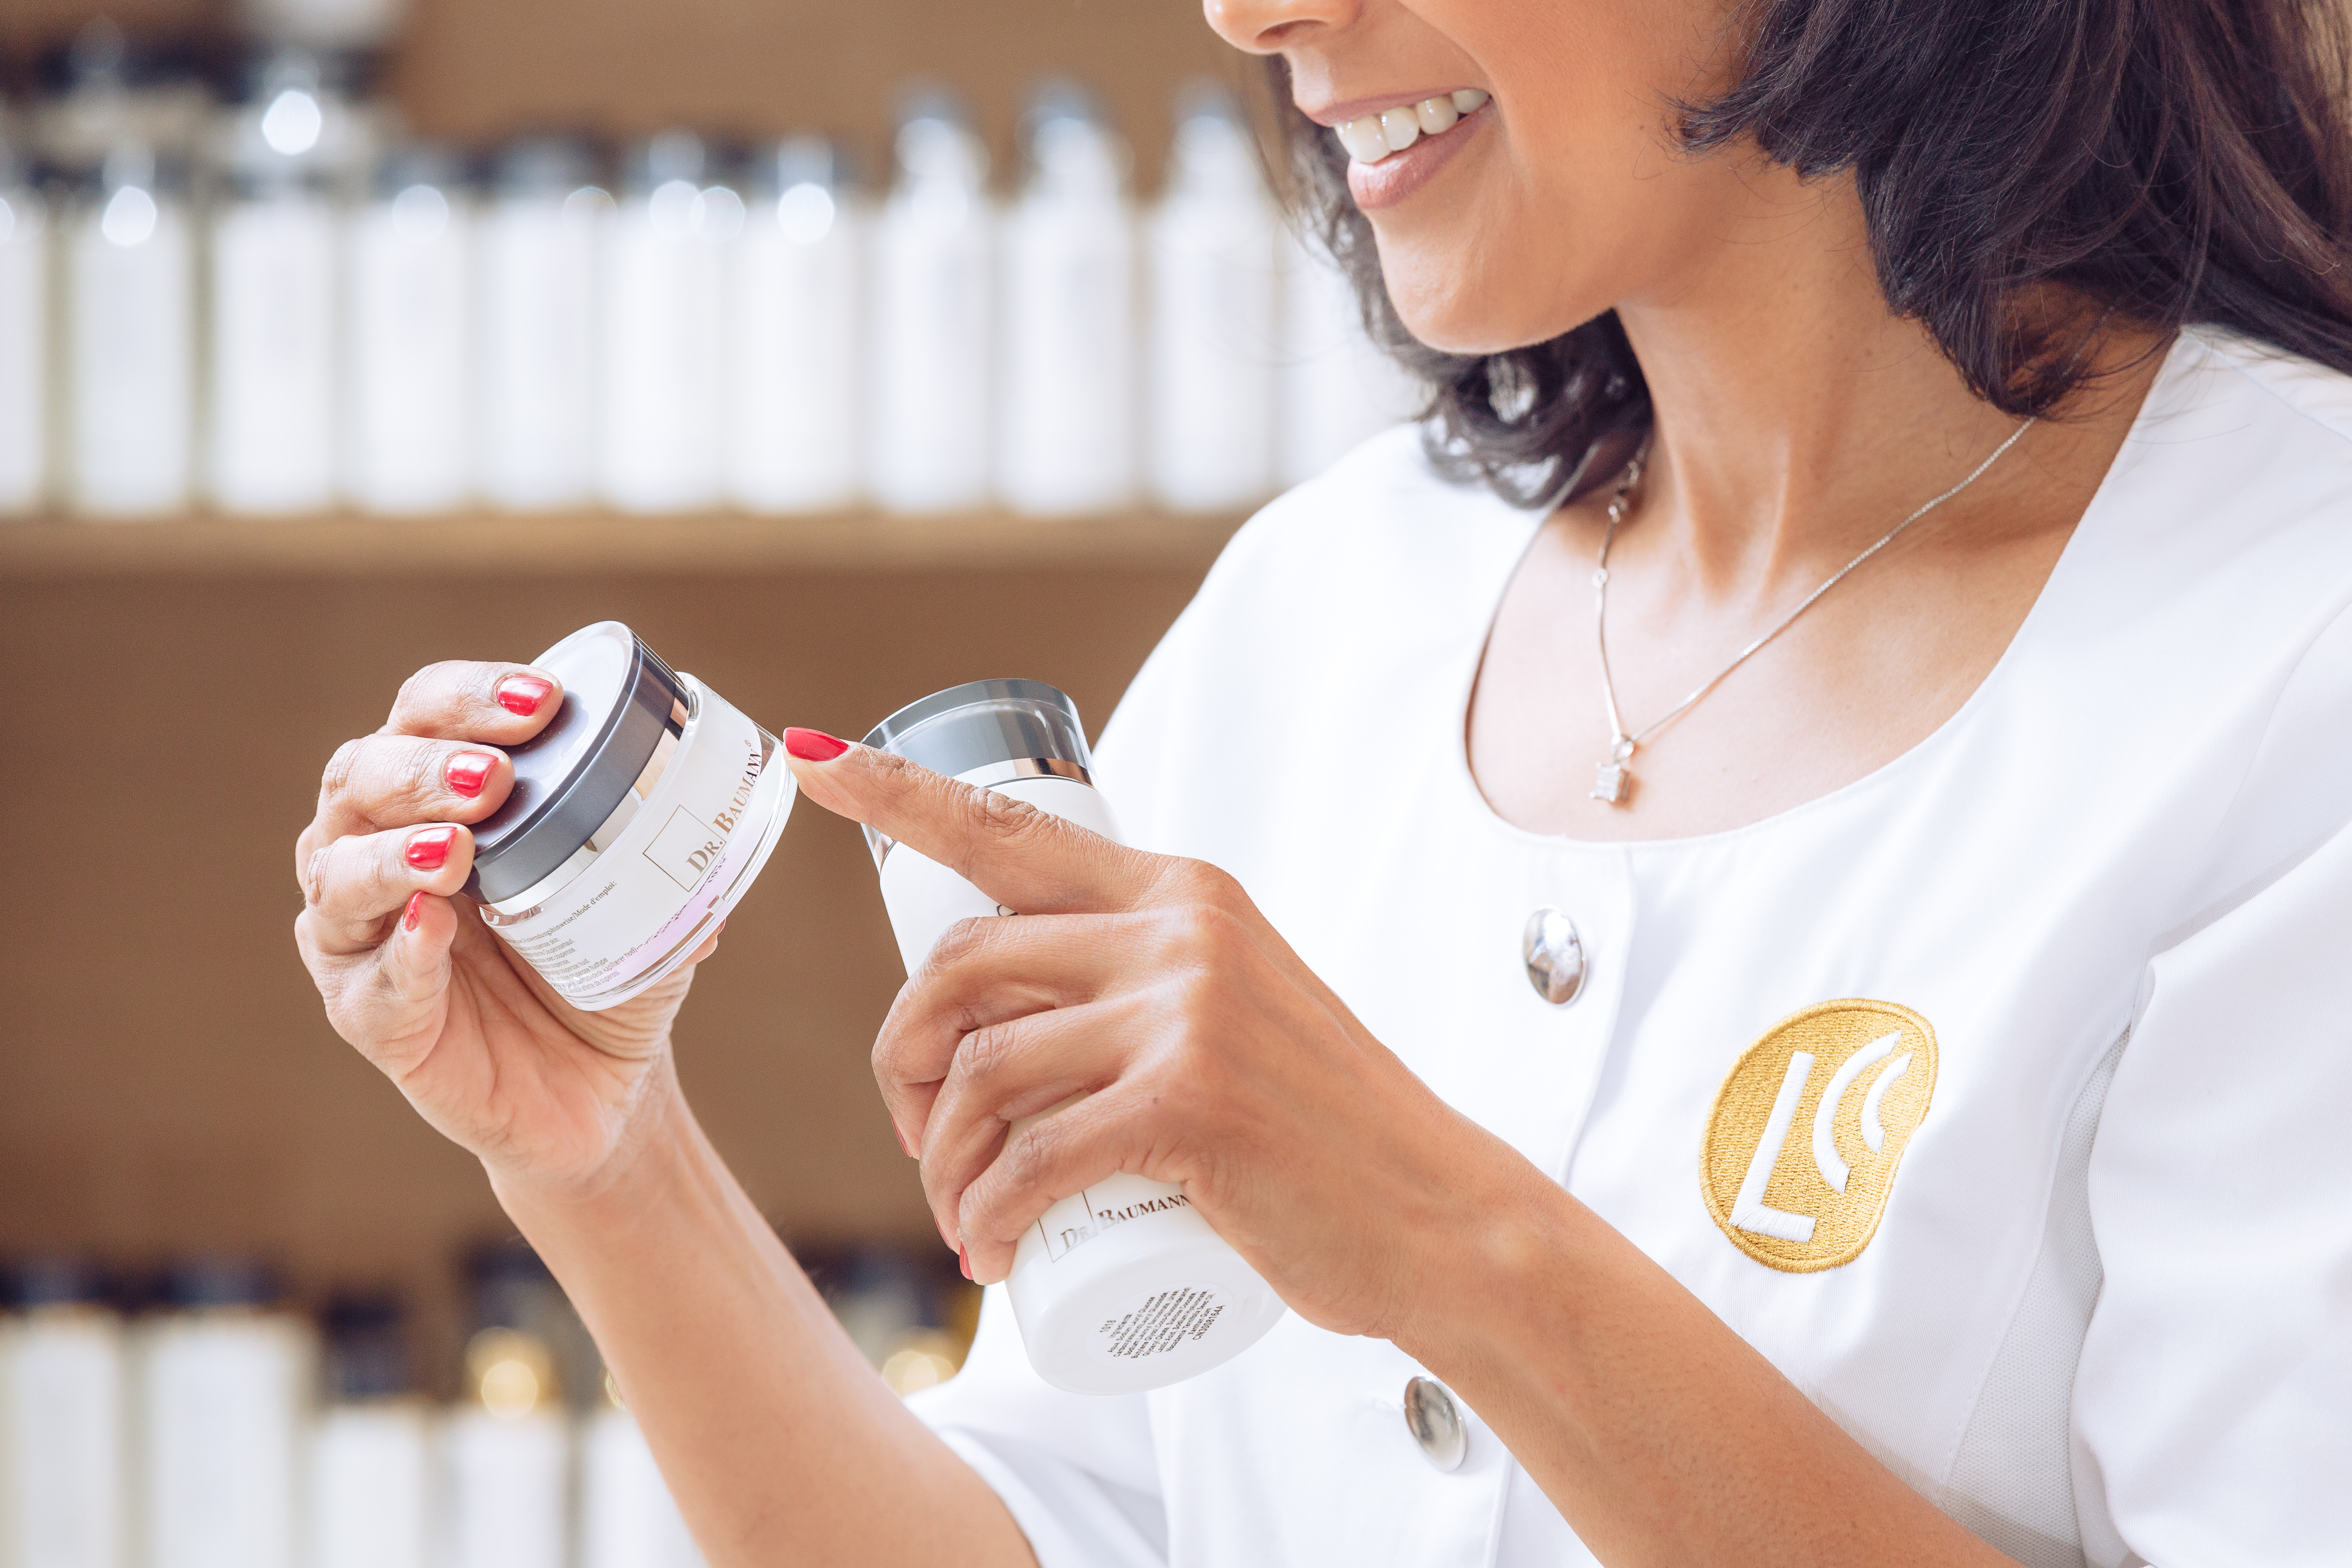 Dr.Baumann Huidverzorgings producten